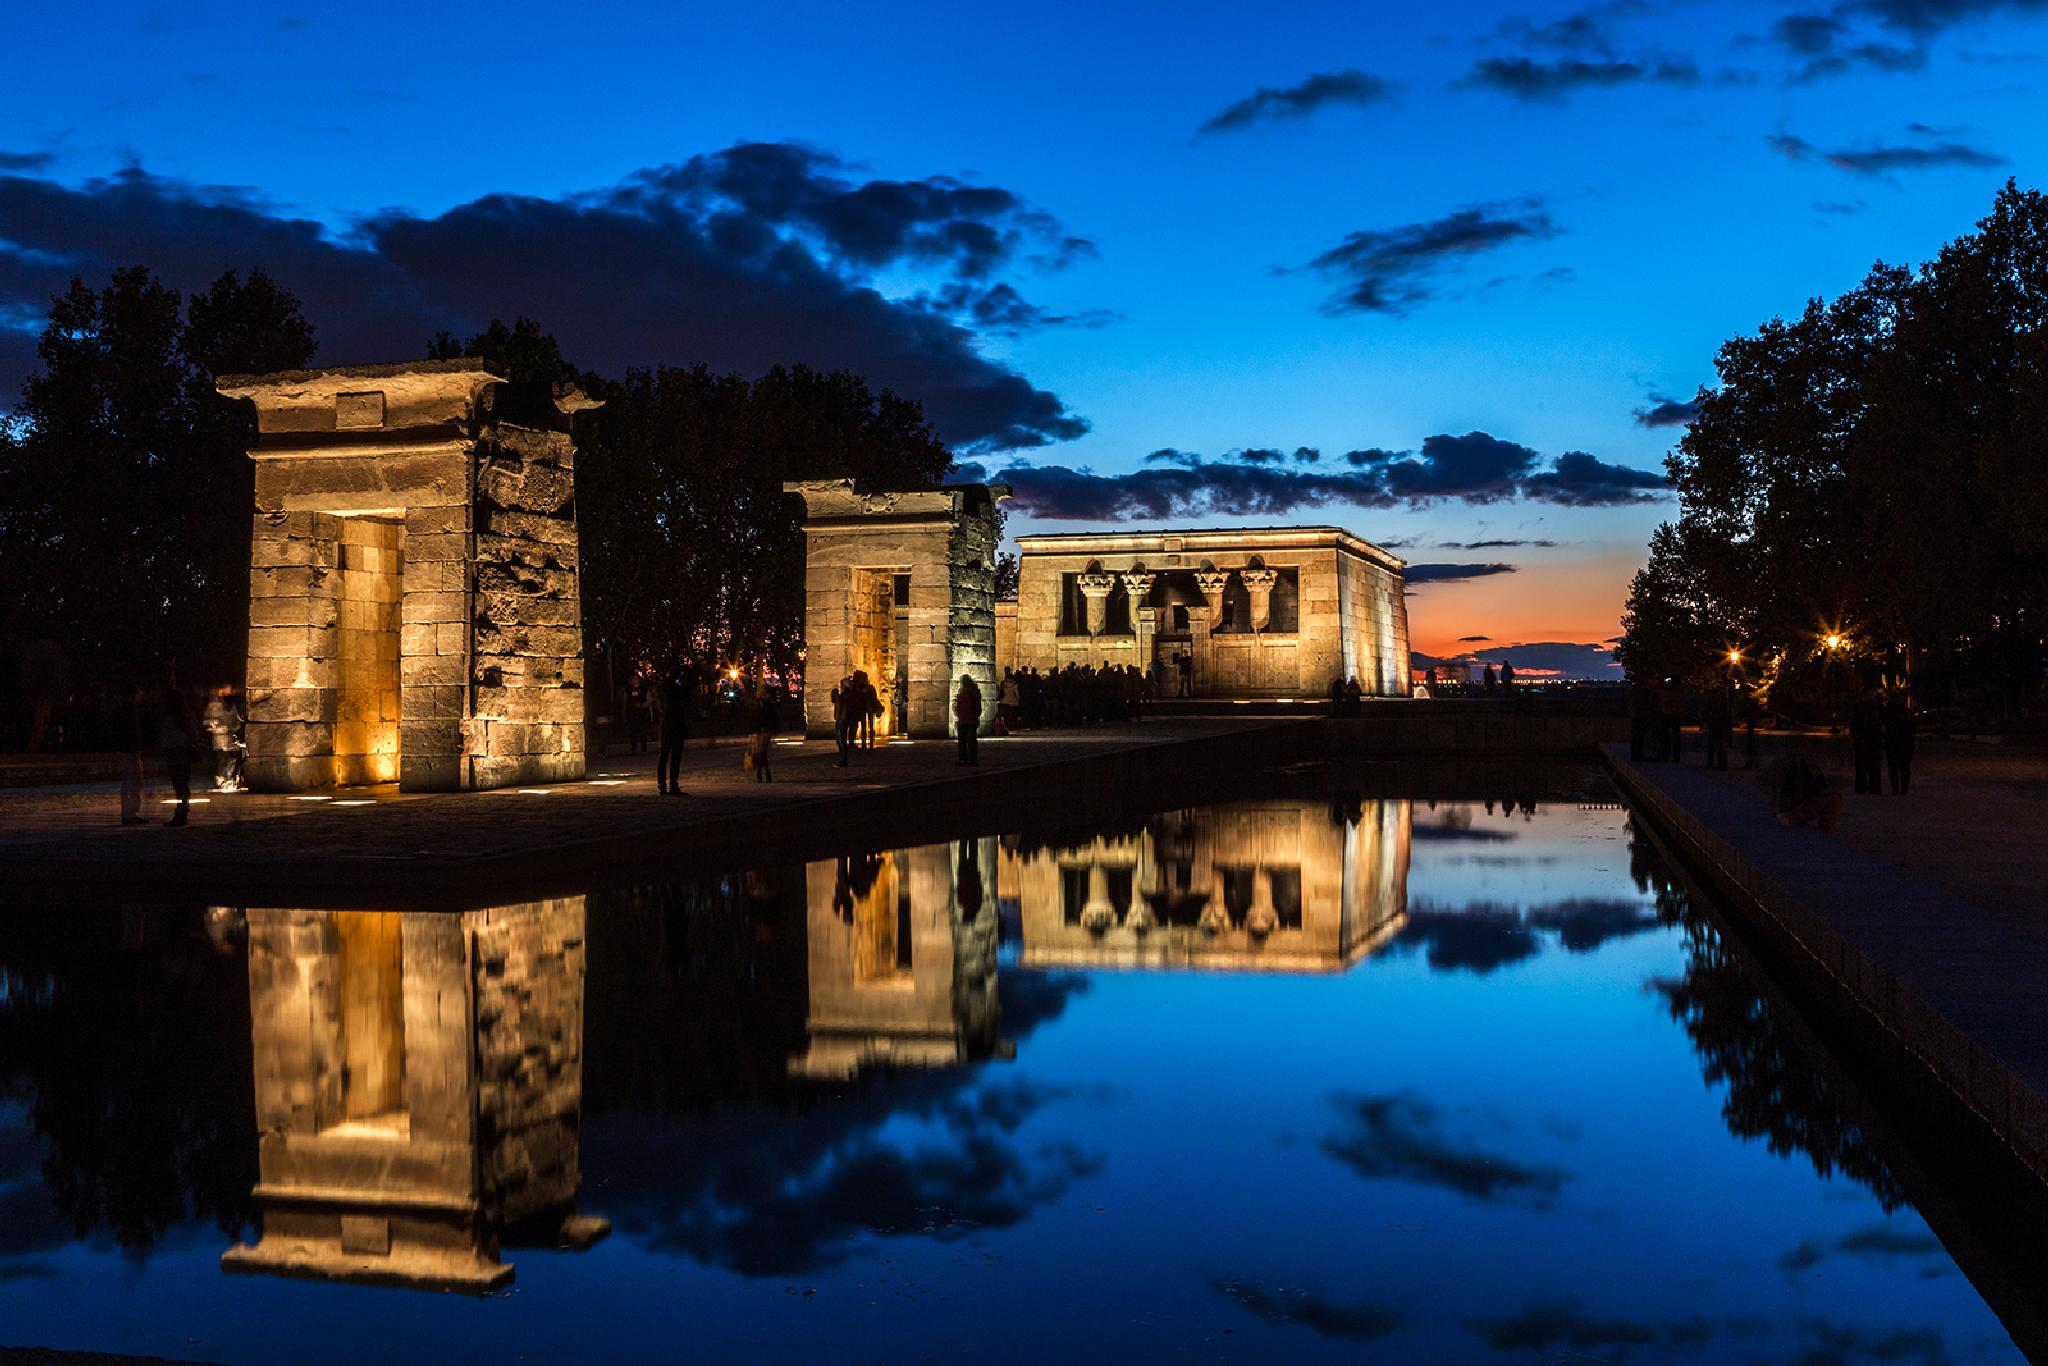 Debod temple. Madrid by Ana Gomez